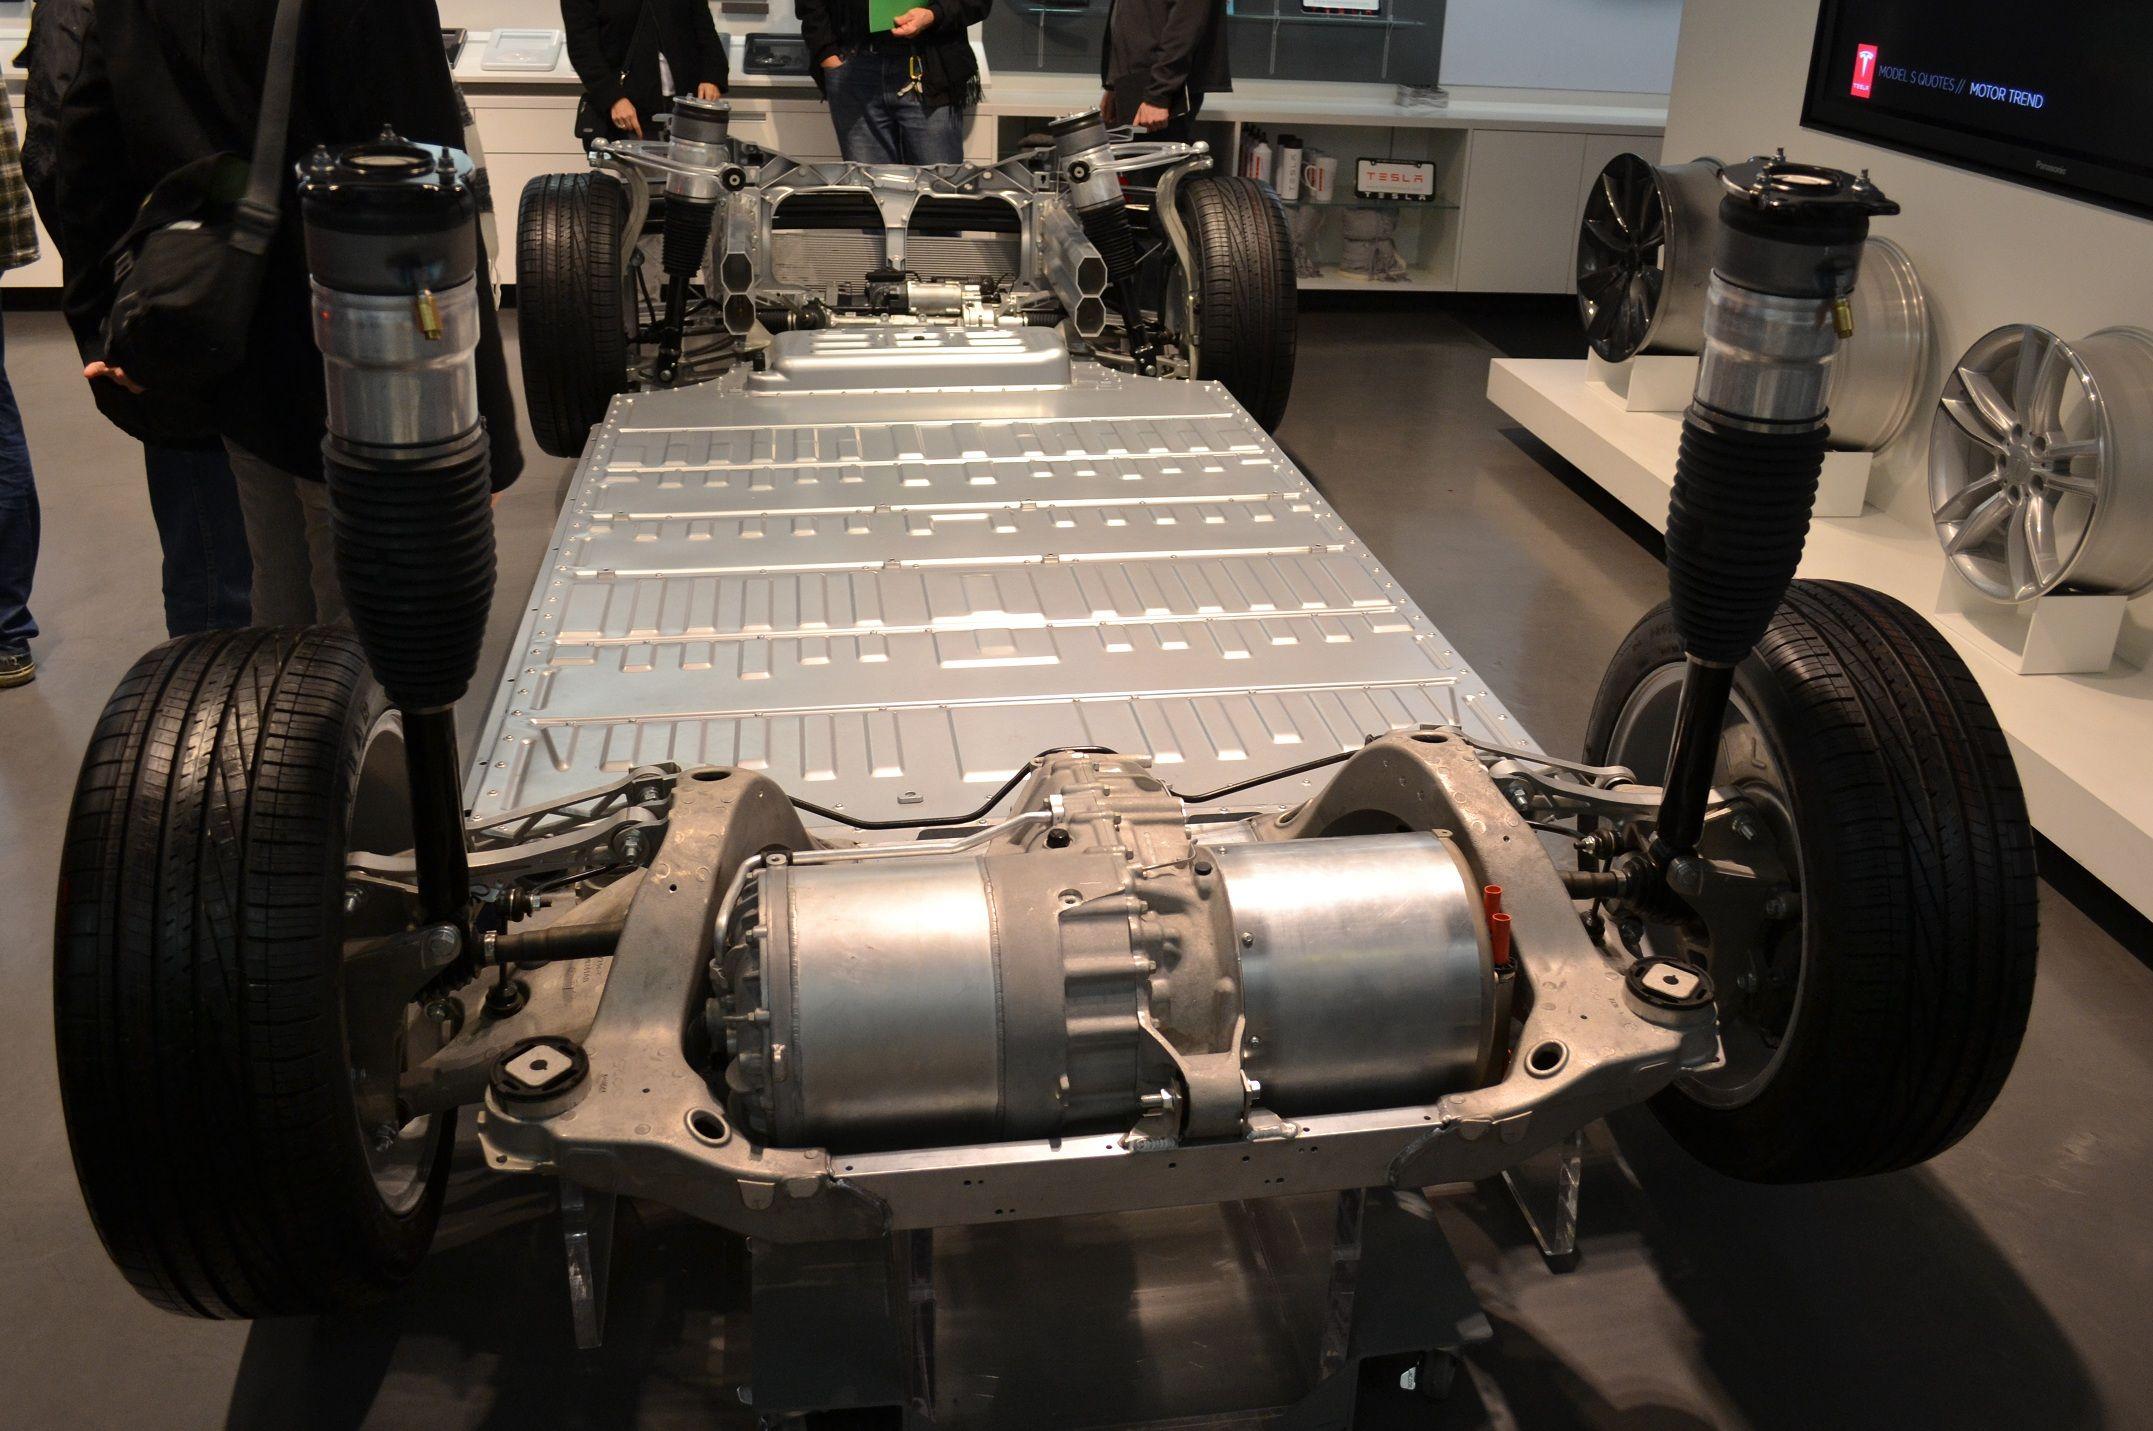 Design of tesla car - Tesla Model S Chassis Google Search